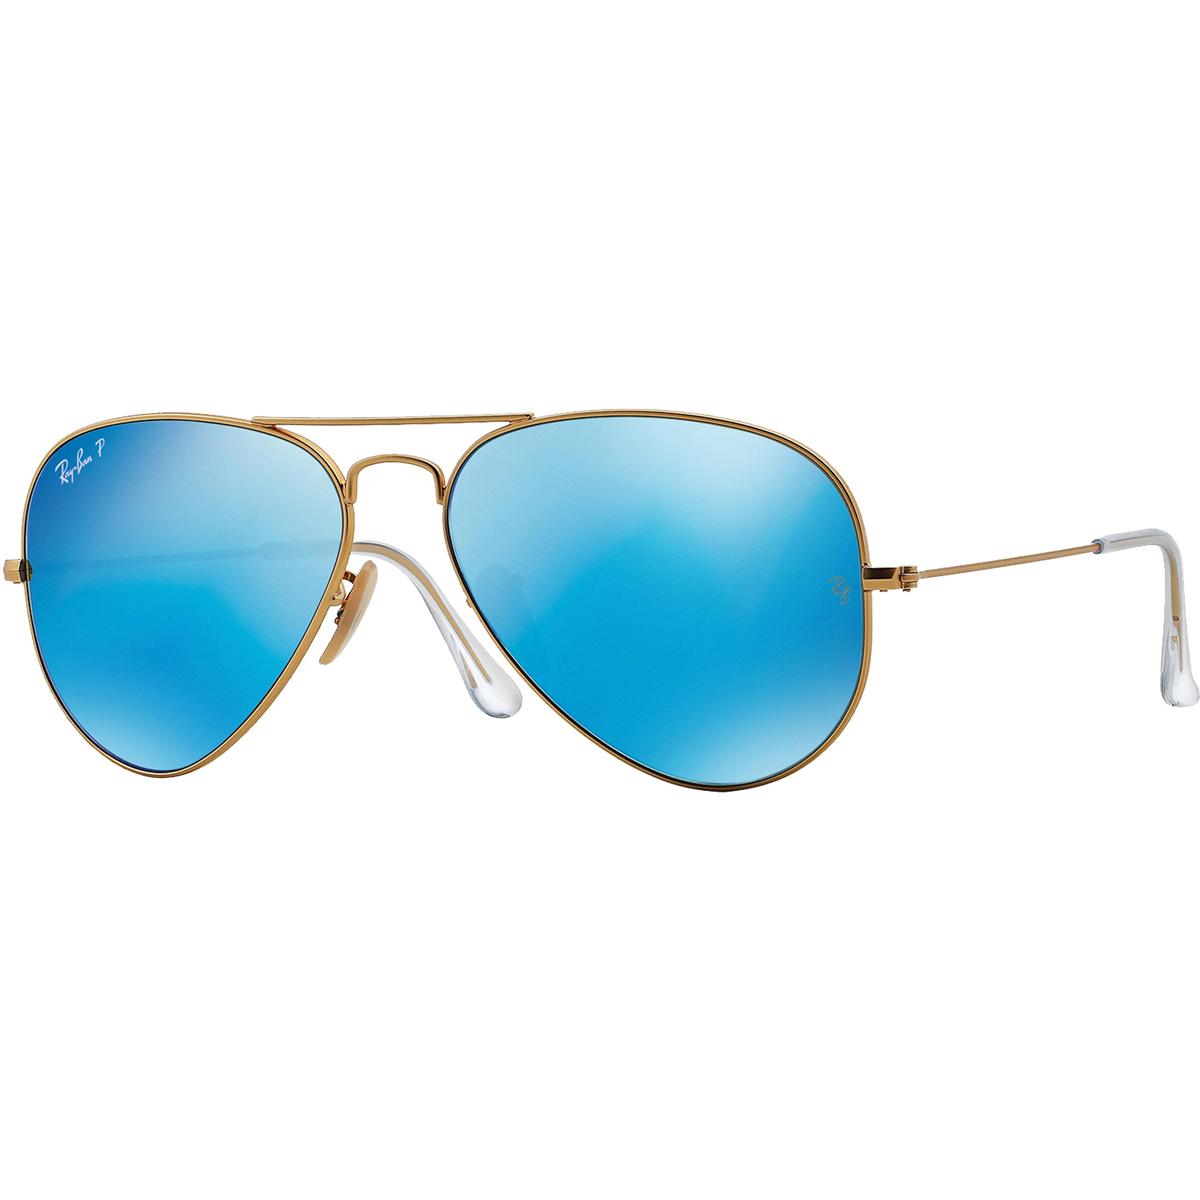 2467a4c219 Ray-Ban Polarized Aviator Sunglasses - Matte Gold  Blue Mirror  0RB30251124L